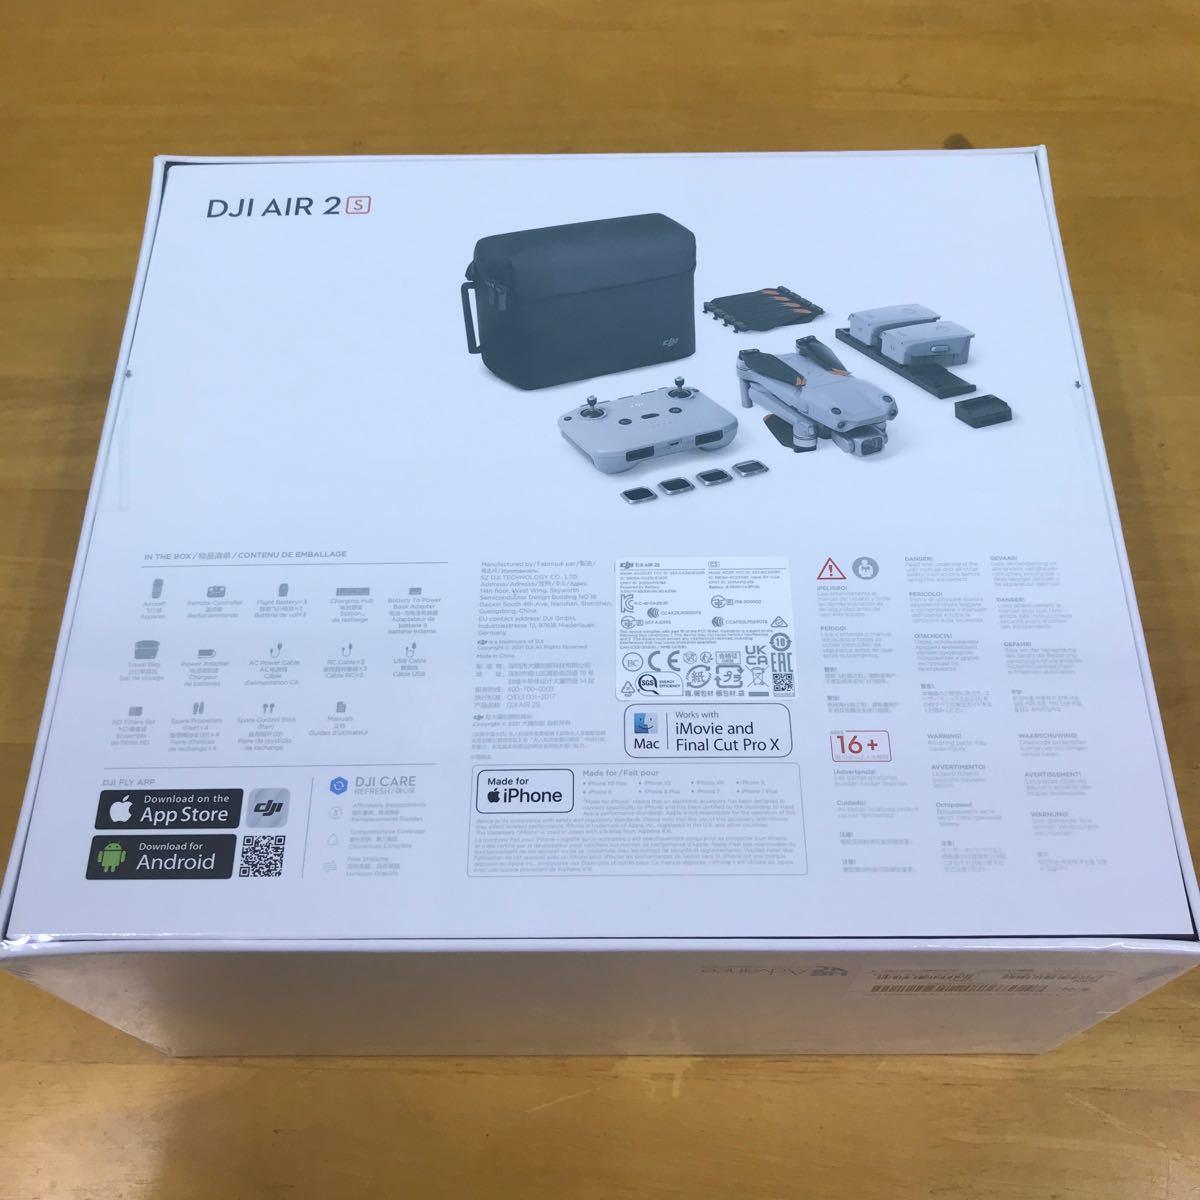 DJI AIR2S フライモアコンボ DJI CARE REFRESH 1年付帯 国内購入品 新品未開封